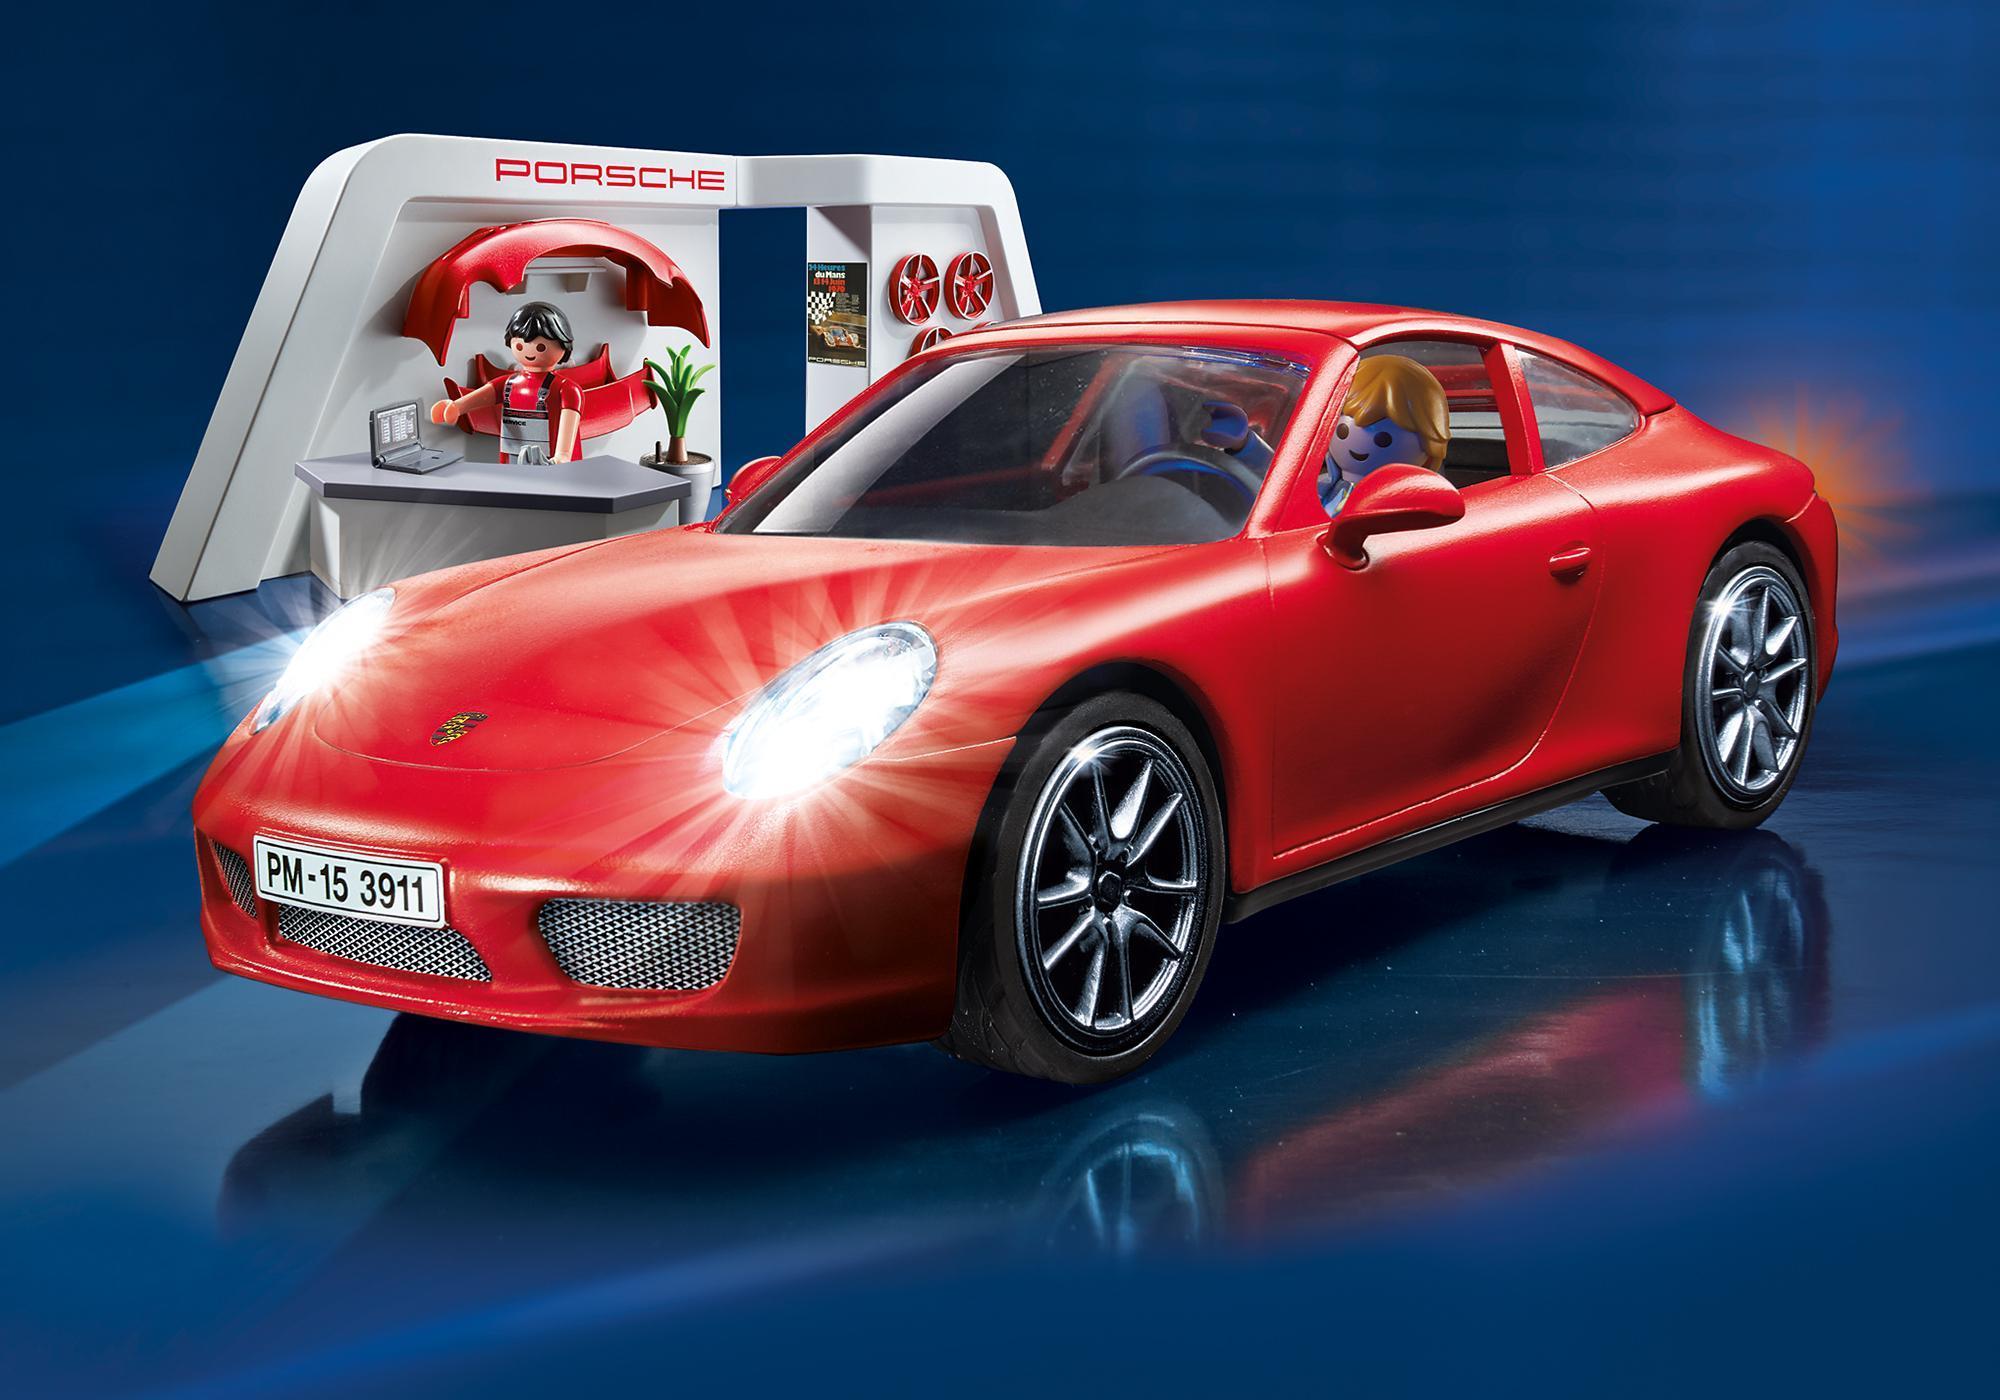 http://media.playmobil.com/i/playmobil/3911_product_detail/Porsche 911 Carrera S